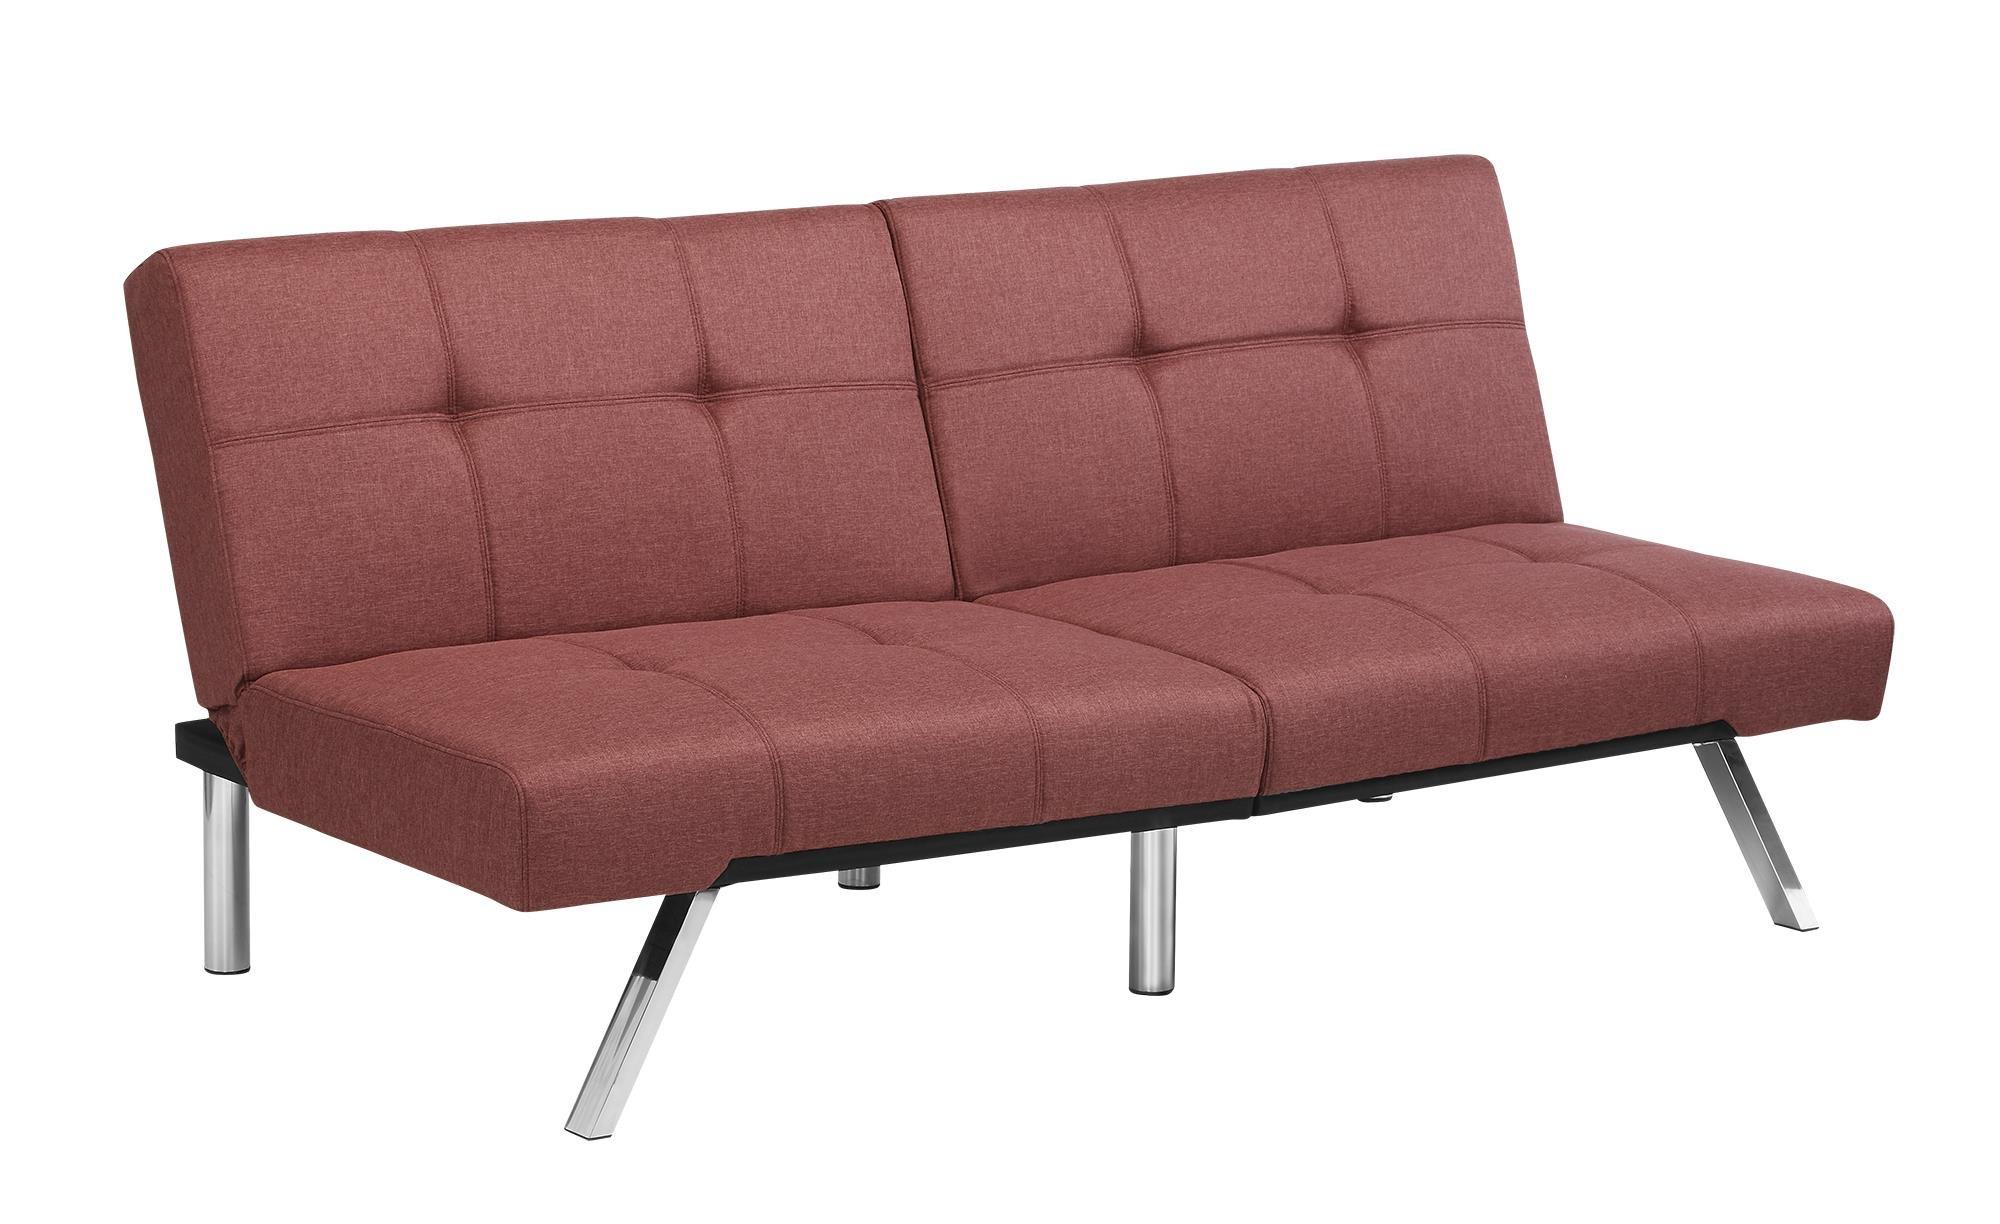 Novogratz Simon Futon Sofa Bed with Chrome Slanted Legs, Mid-Century Modern Design, Rich Marsala Linen by Novogratz